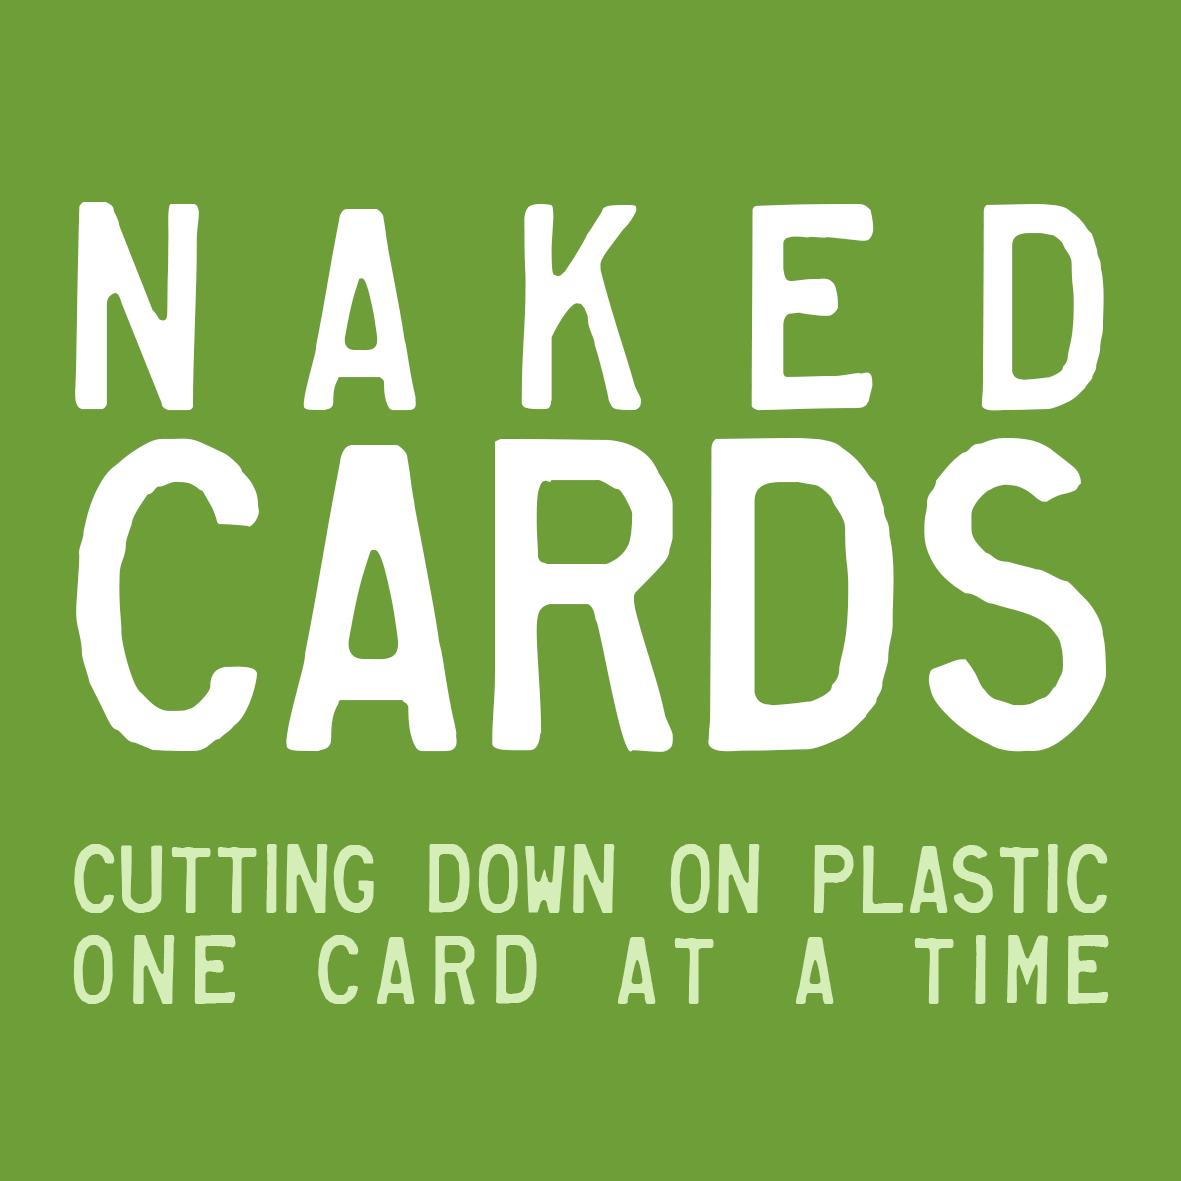 nakedcards